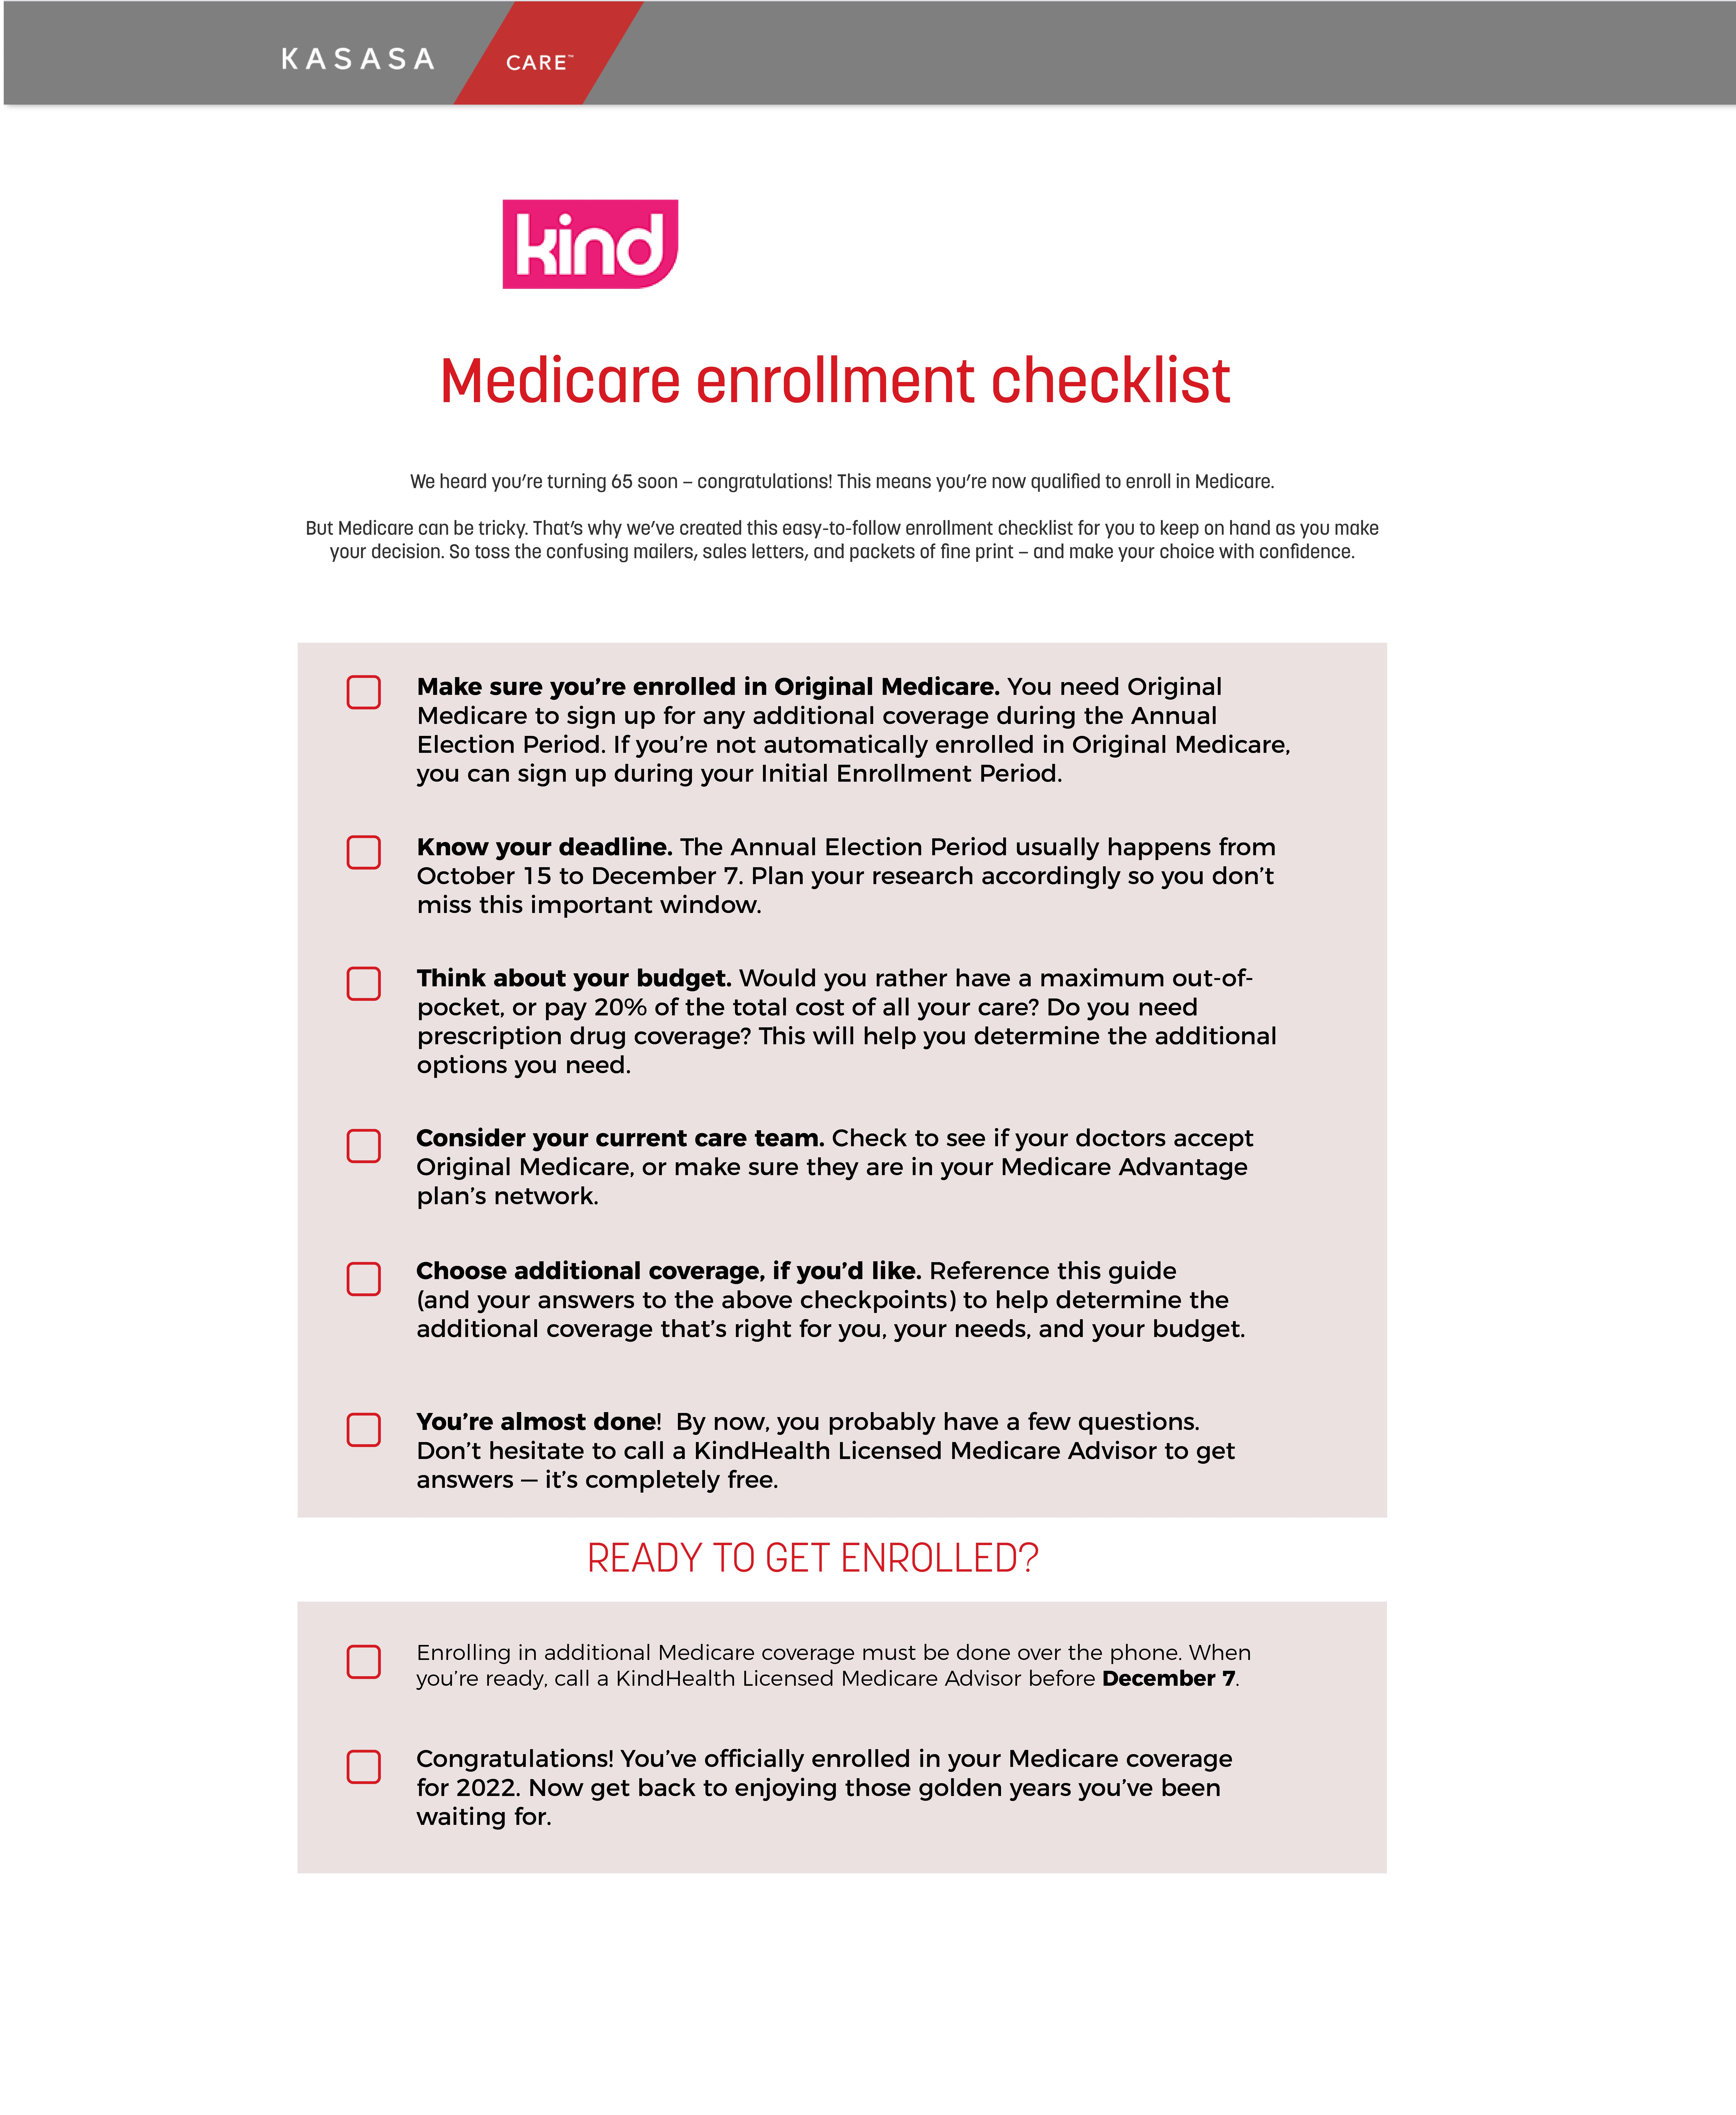 Medicare Open Enrollment Checklist